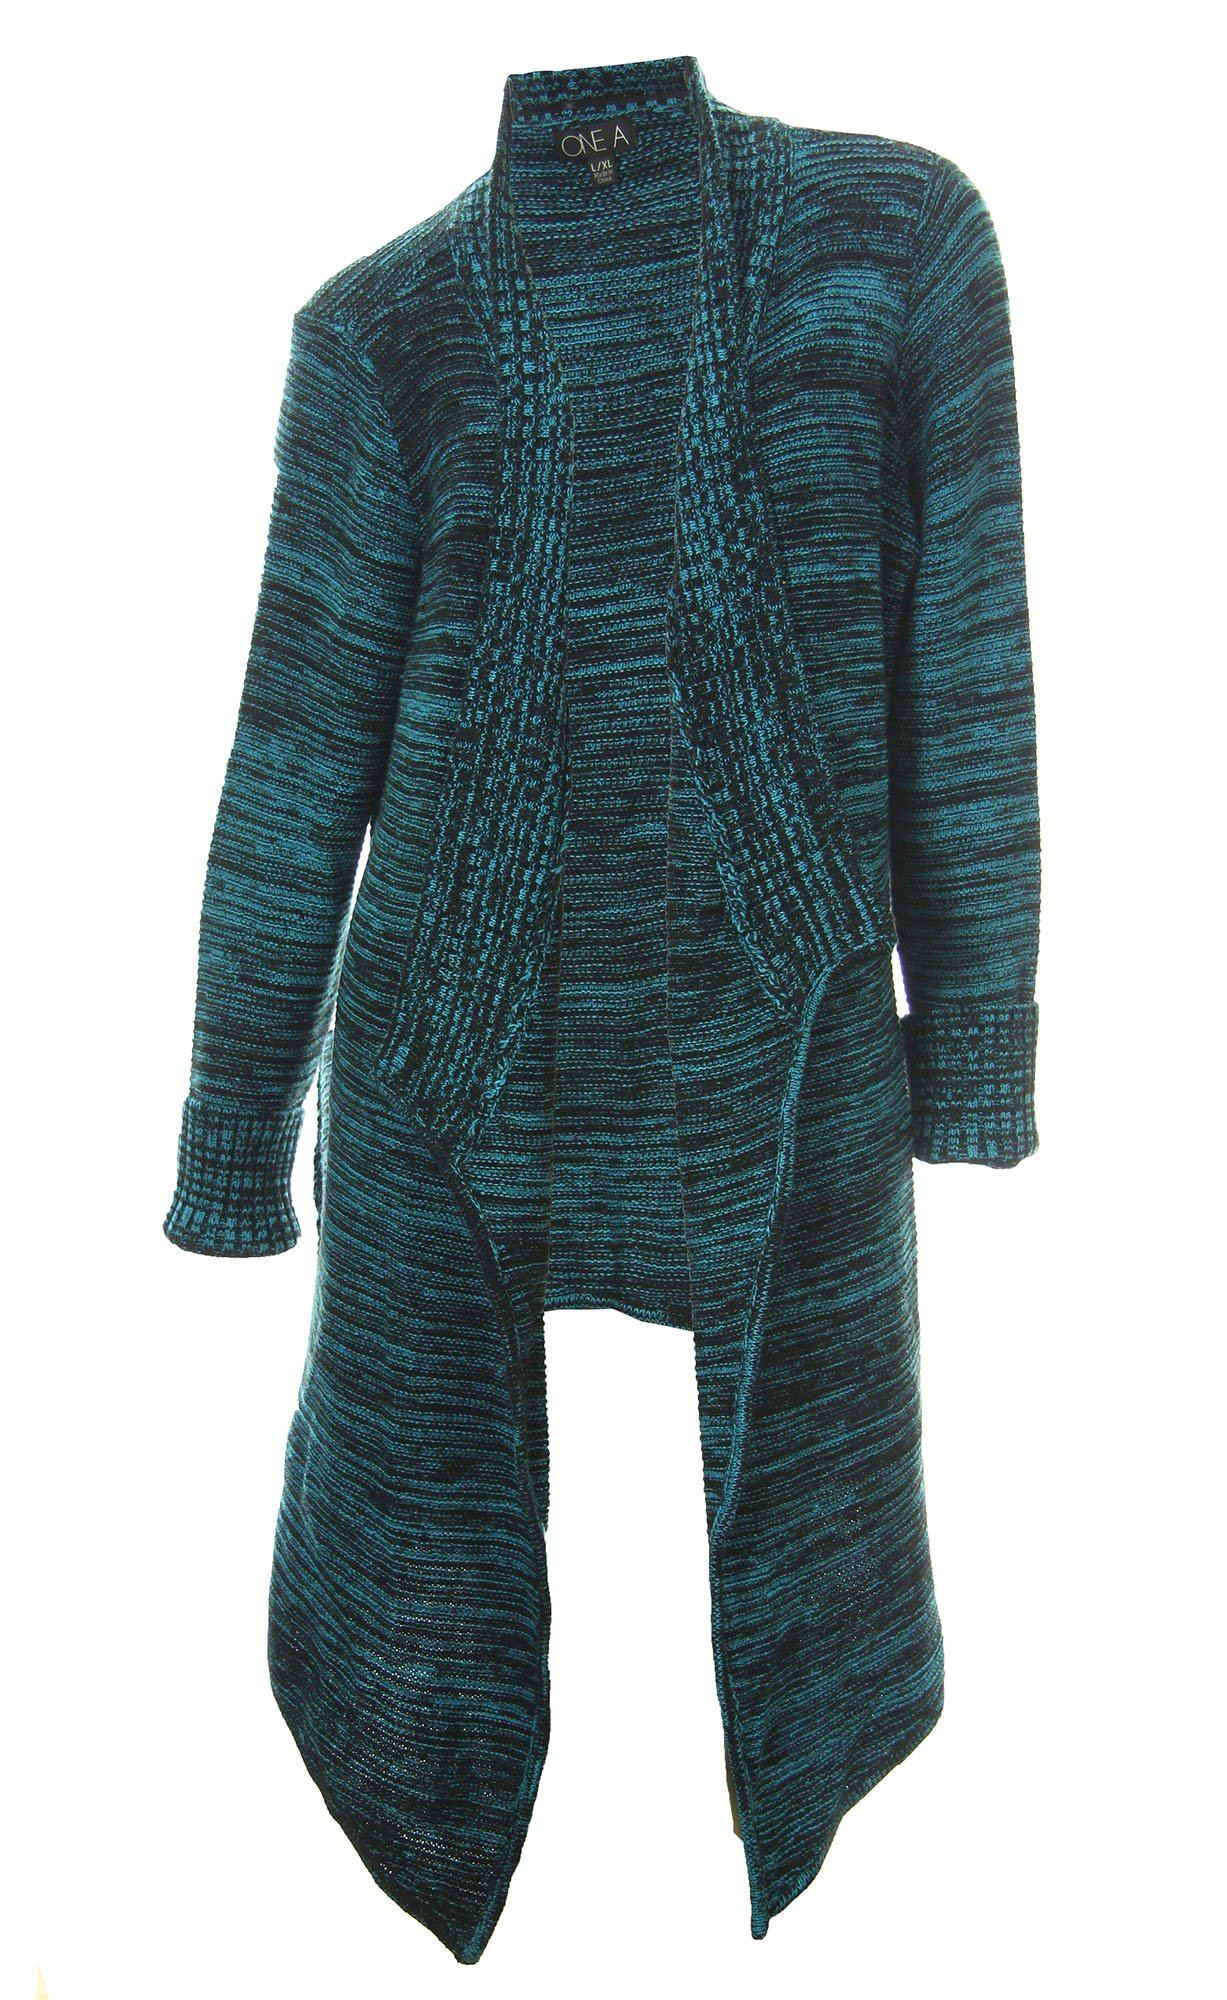 One A Women's Long Sleeve Asymmetrical Hemline Cardigan Sweater Large Turquiose